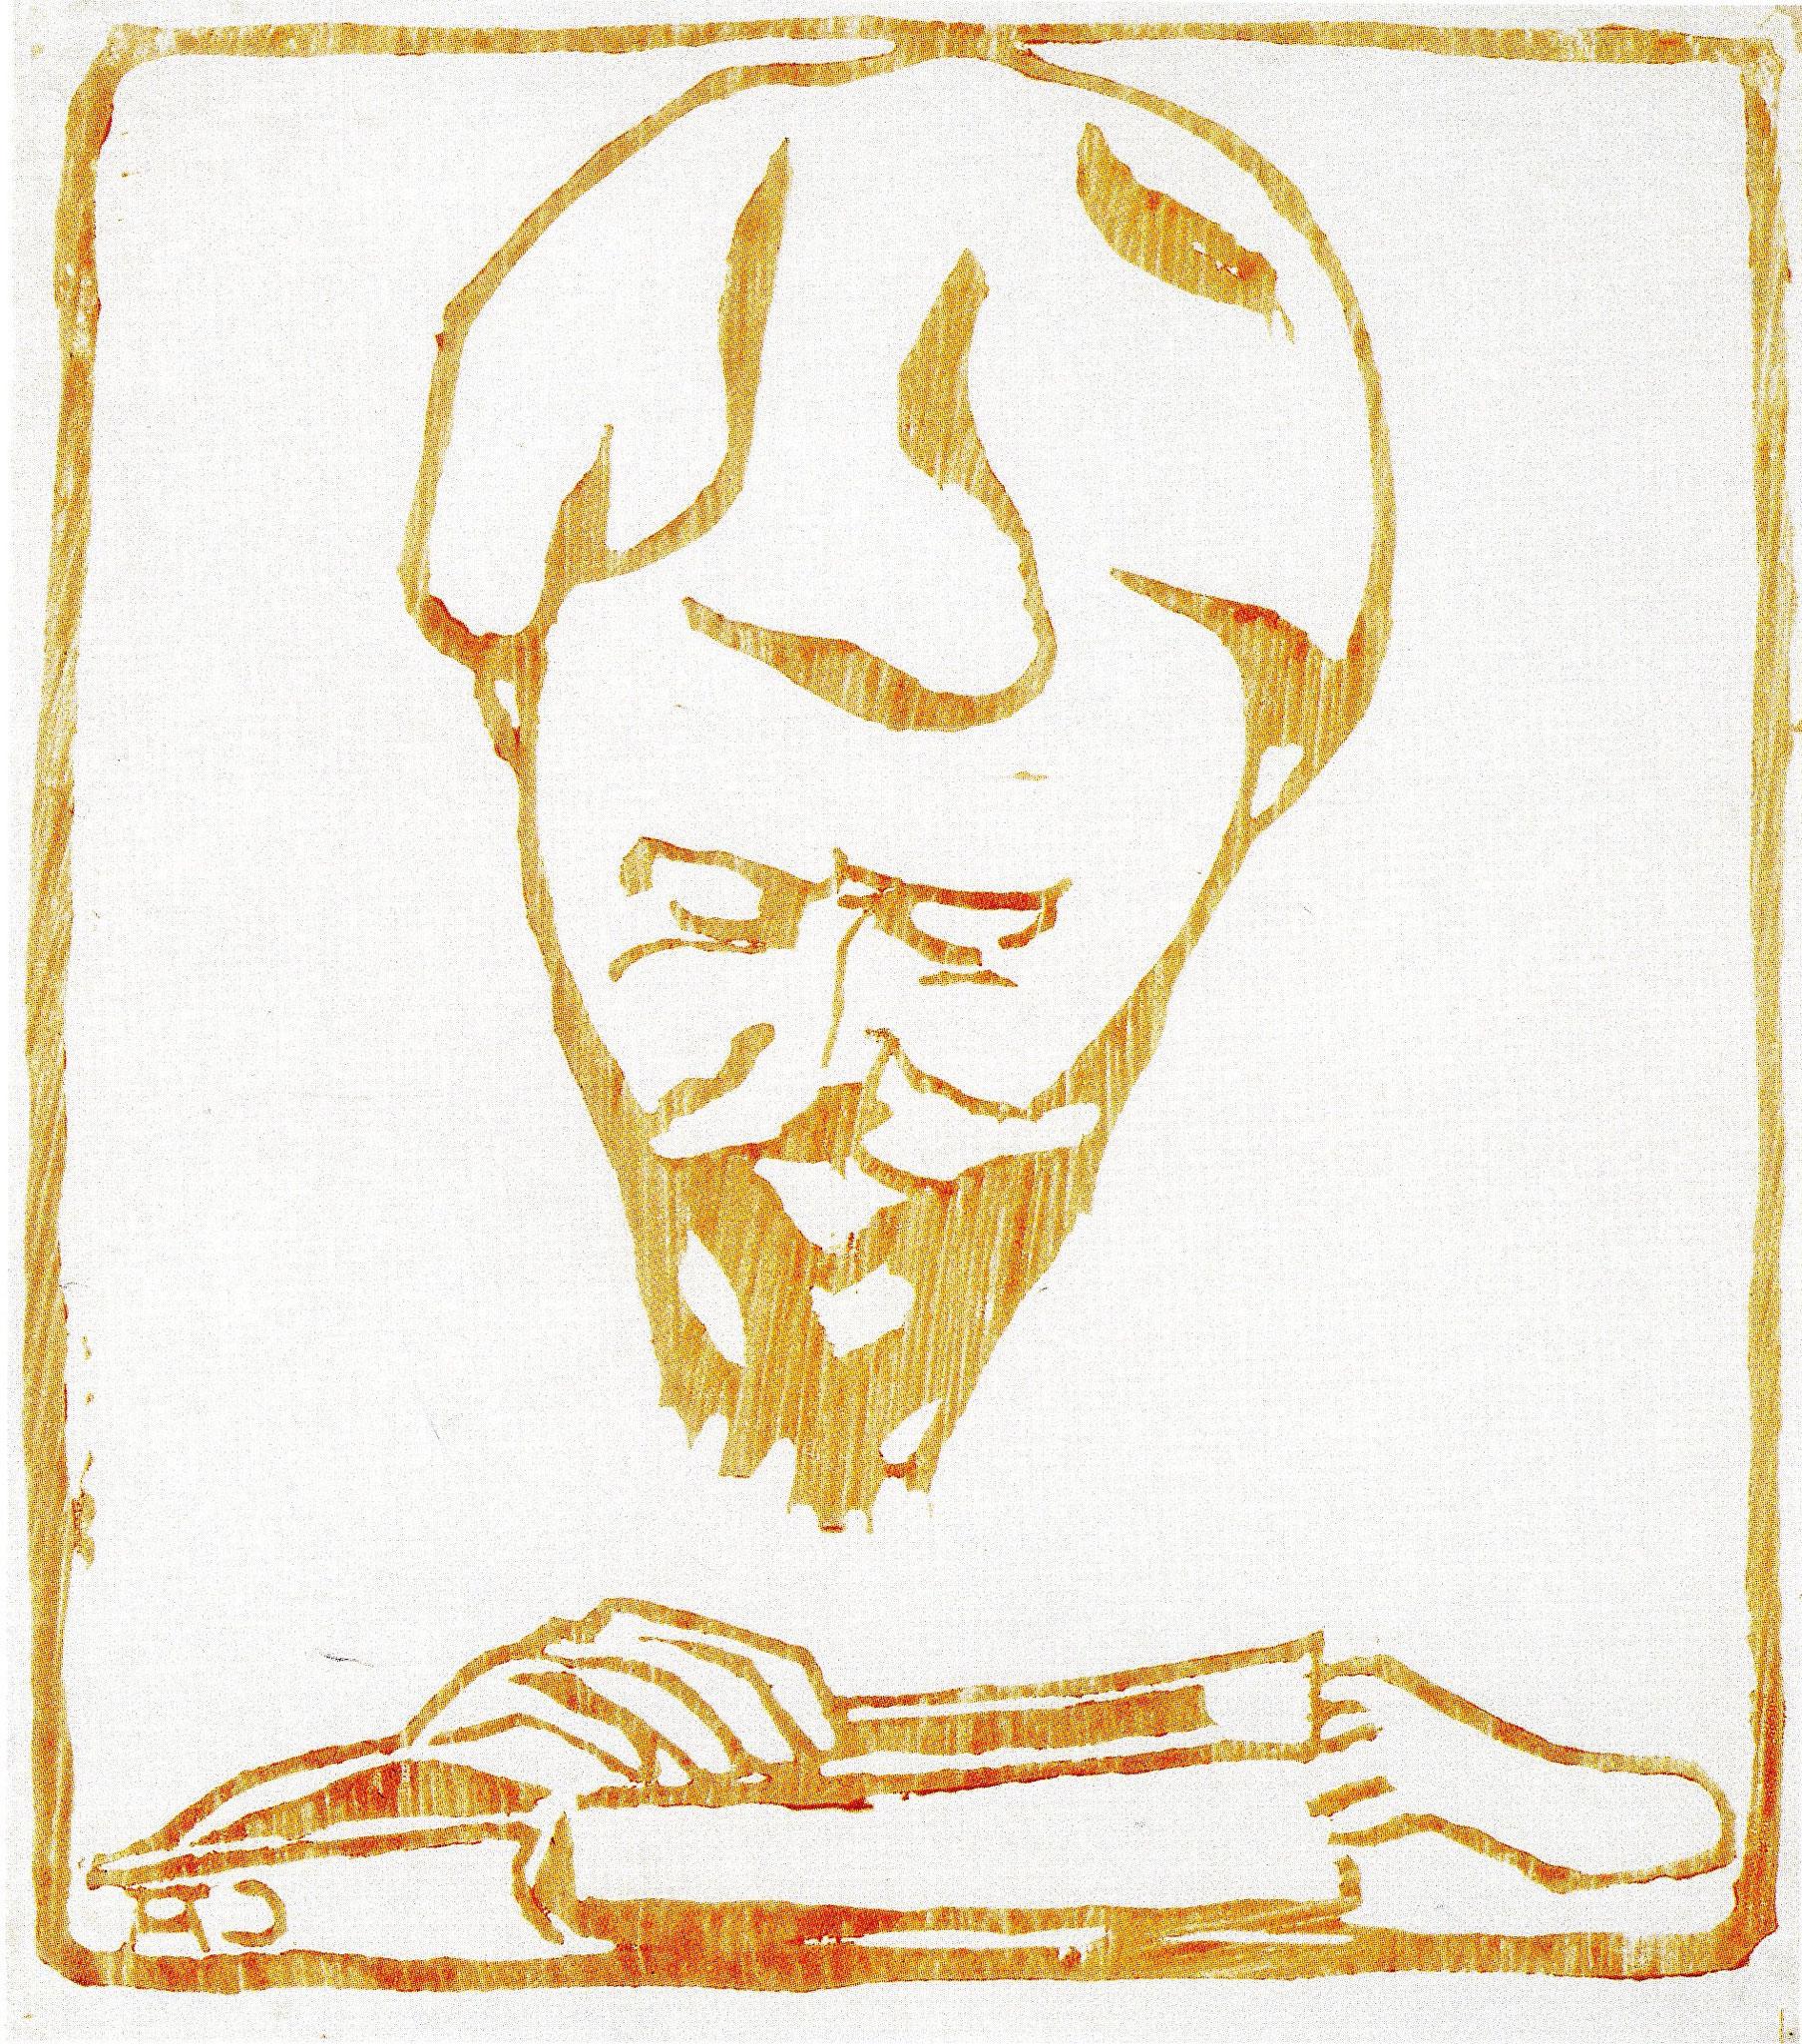 Cuno Amiet, Giovanni Giacometti beim Lesen, Farbholzschnitt, 1904